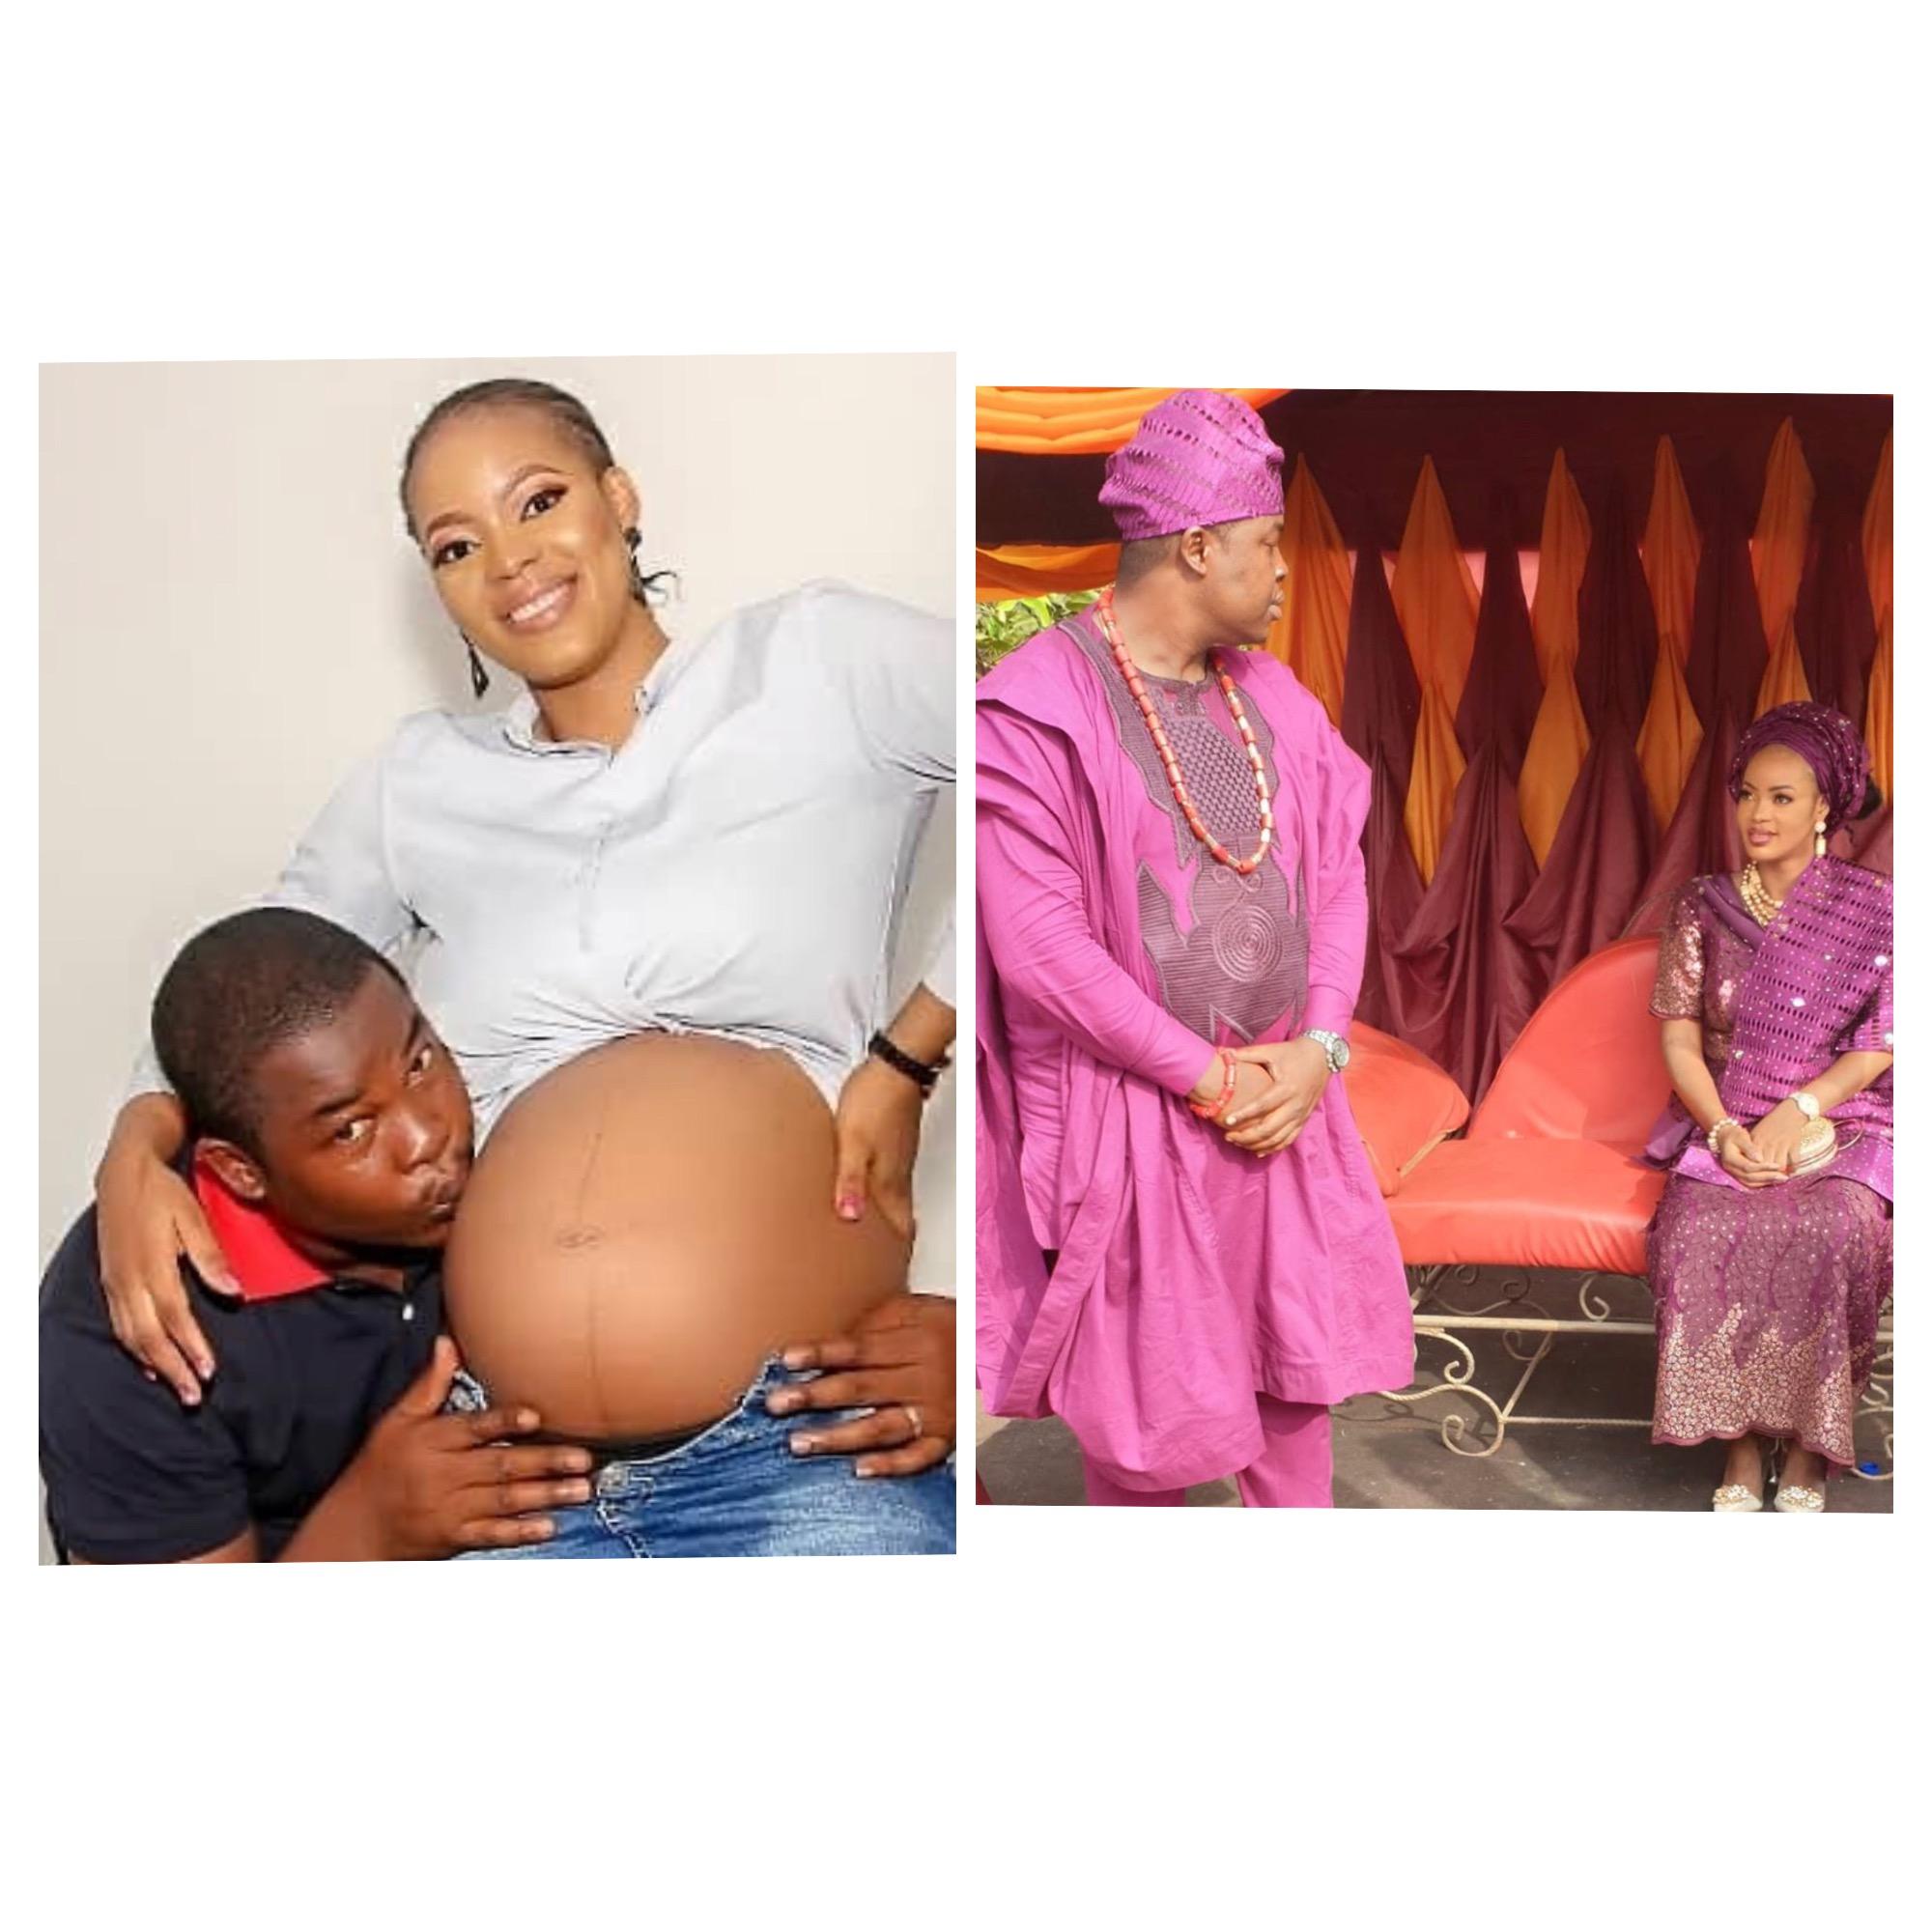 Yoruba actor, Babatee and his wife, Feranmi